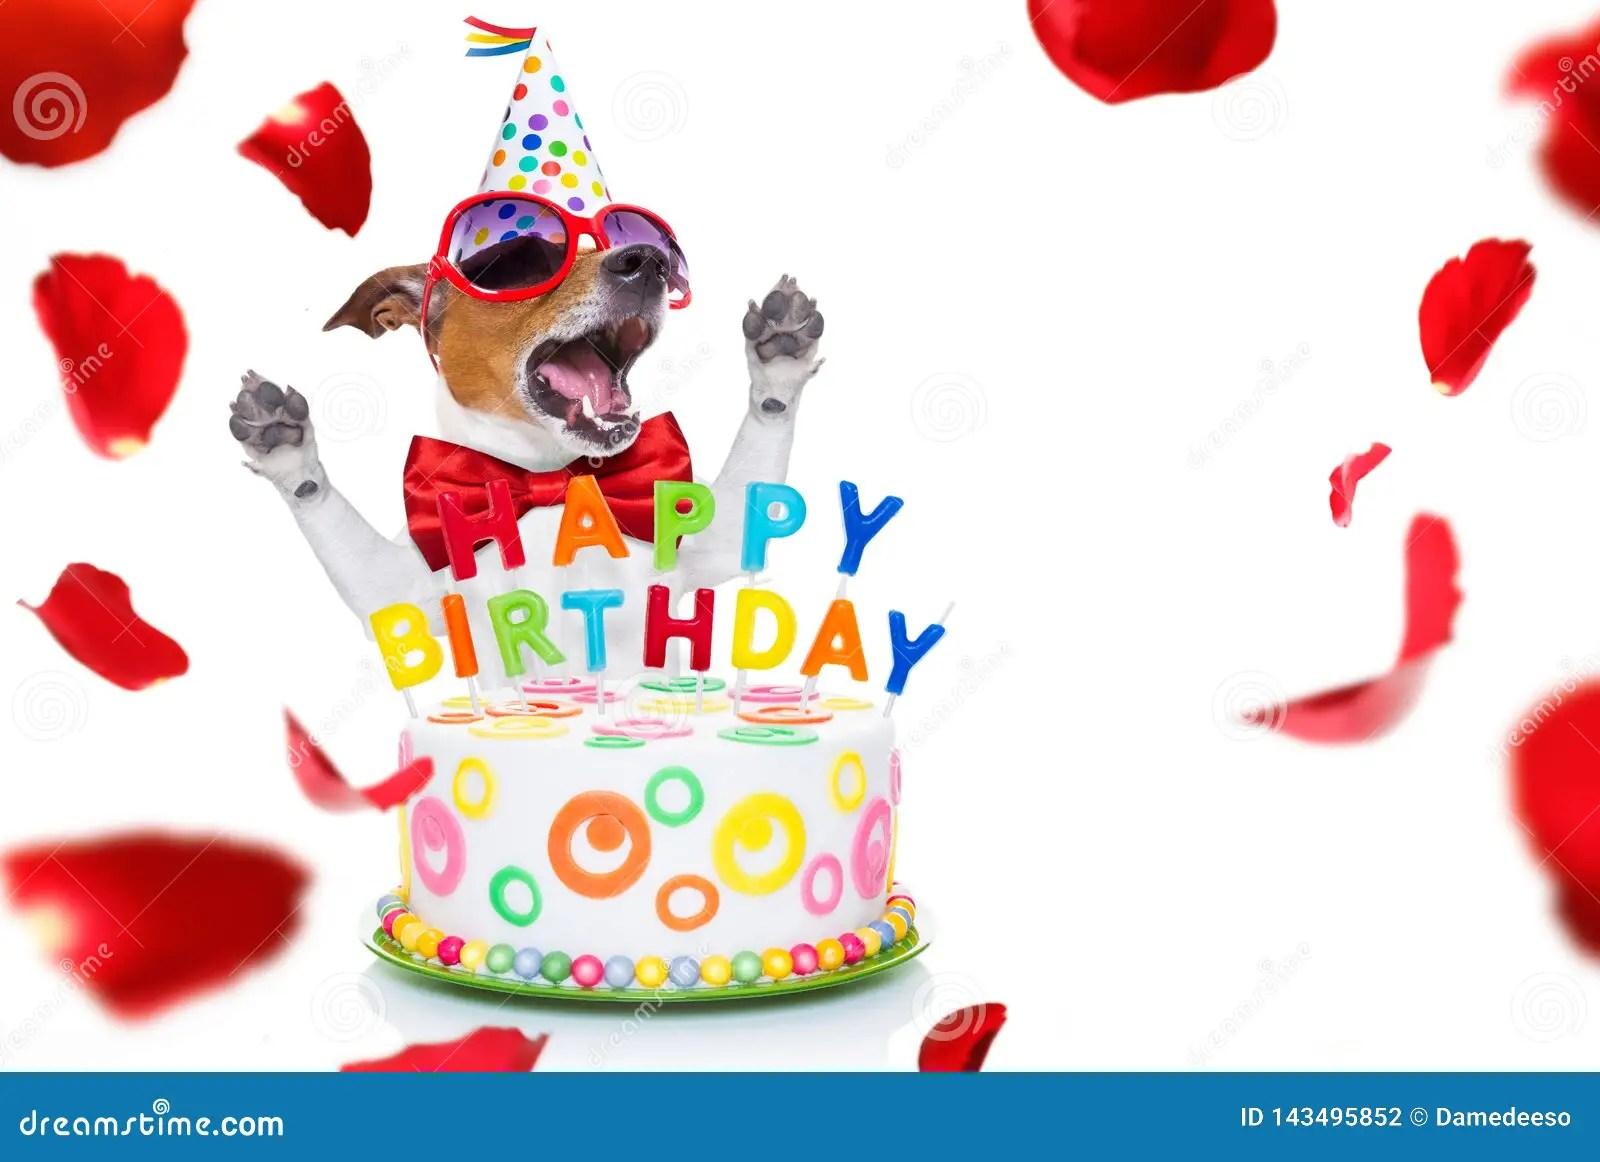 Happy Birthday Dog Stock Photo Image Of Laugh Funny 143495852